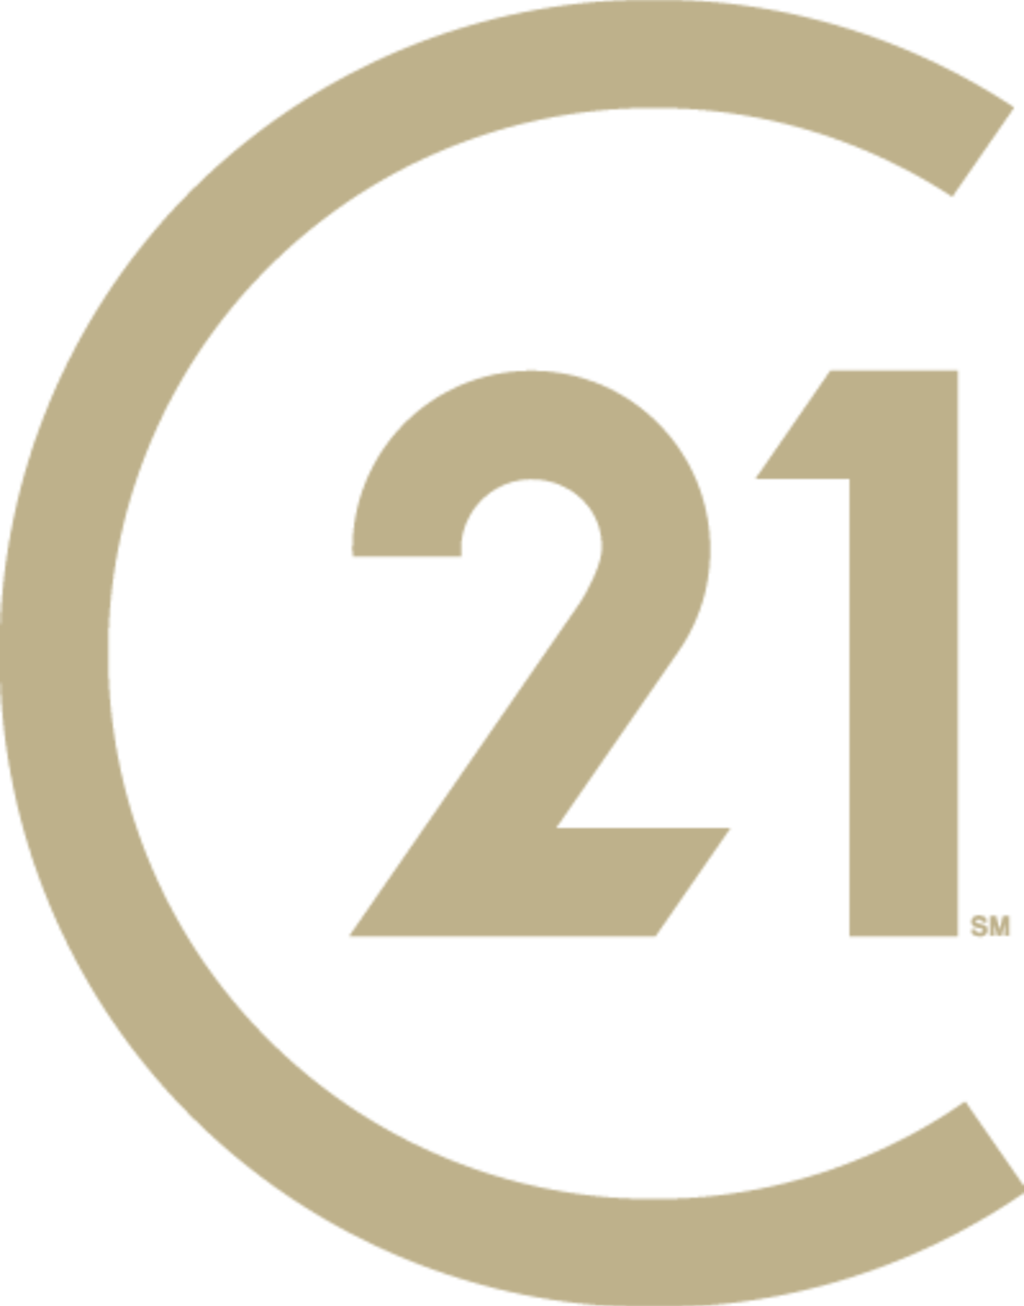 CENTURY 21 Condos and Lofts